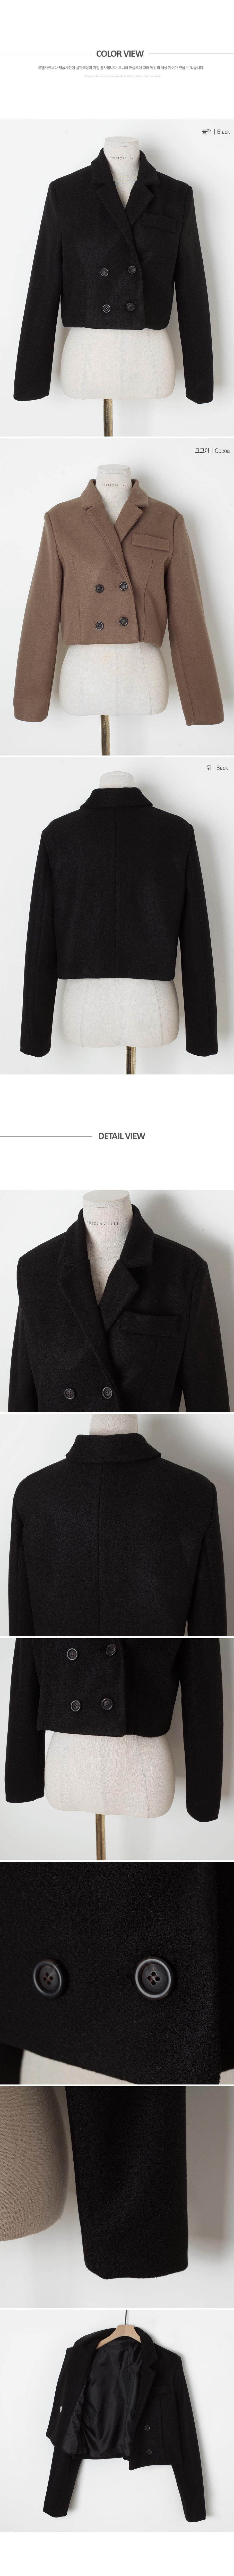 Daily Short Length Jacket